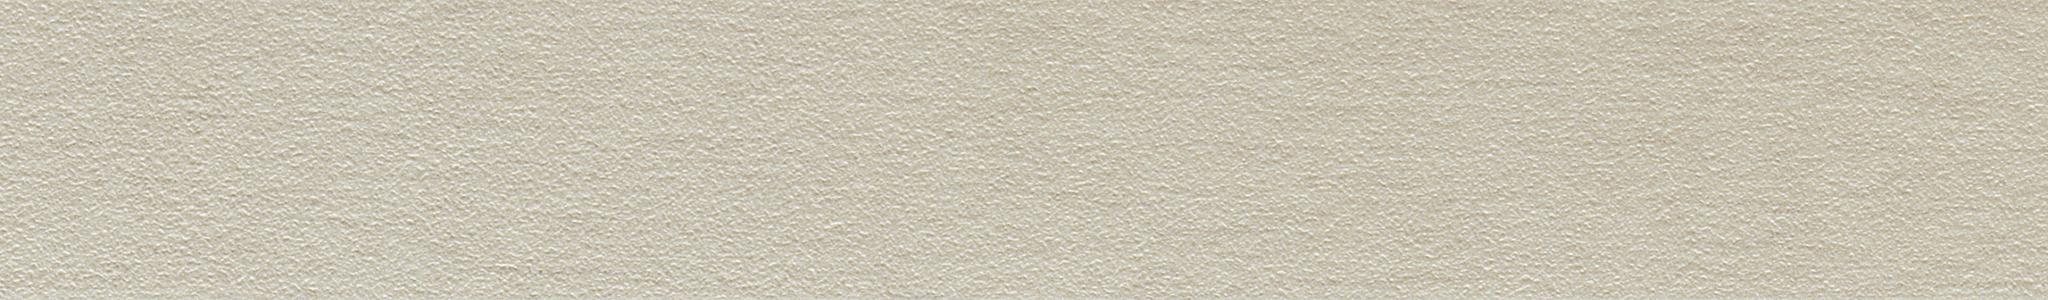 HD 29784 ABS hrana ocel Microline perla